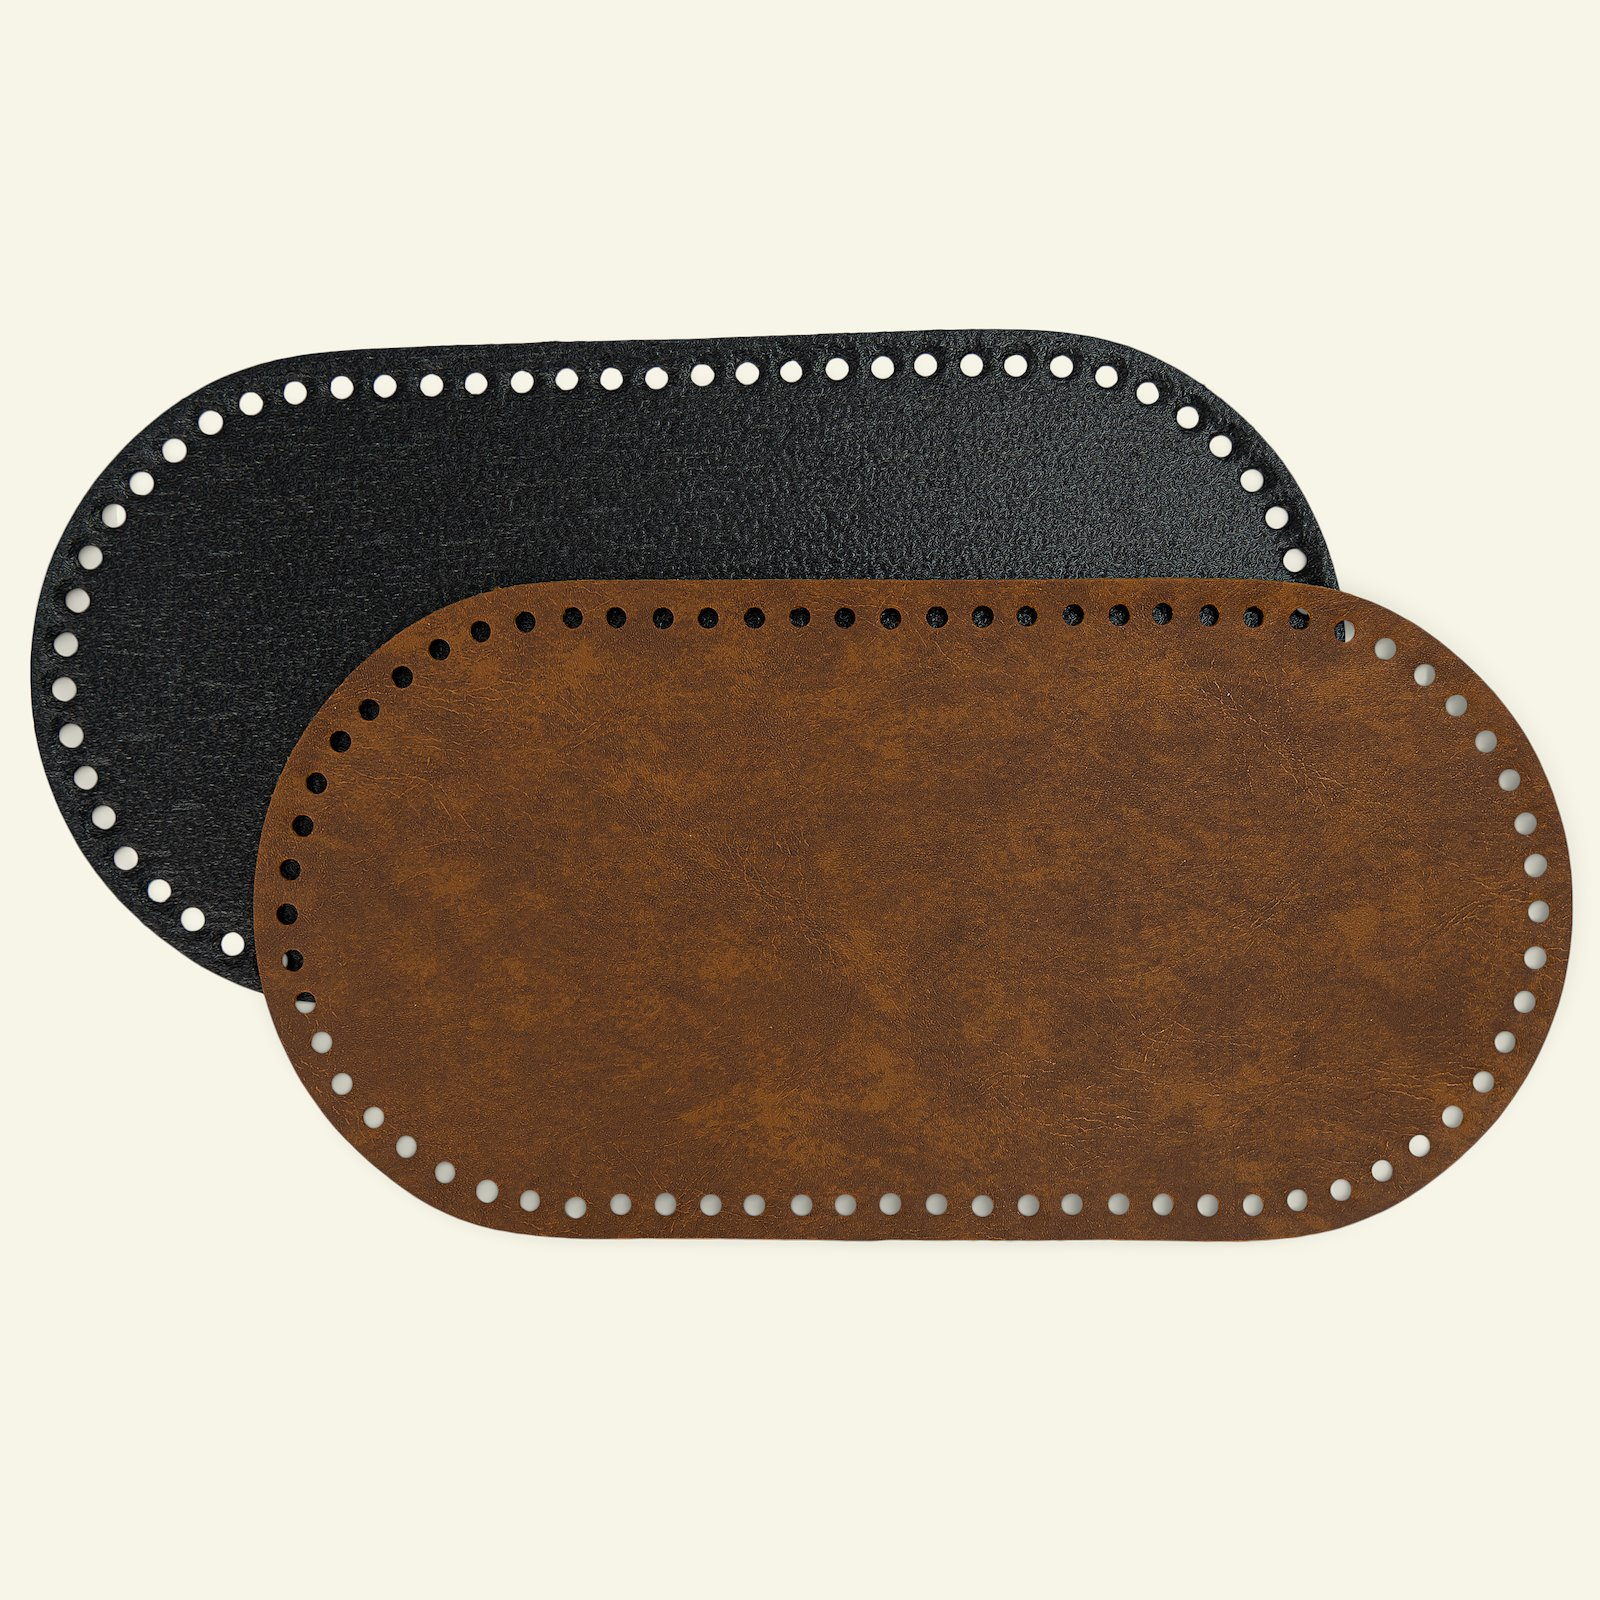 FRAYA bag/basket bottom 15x30cm brown 1p 83312_pack